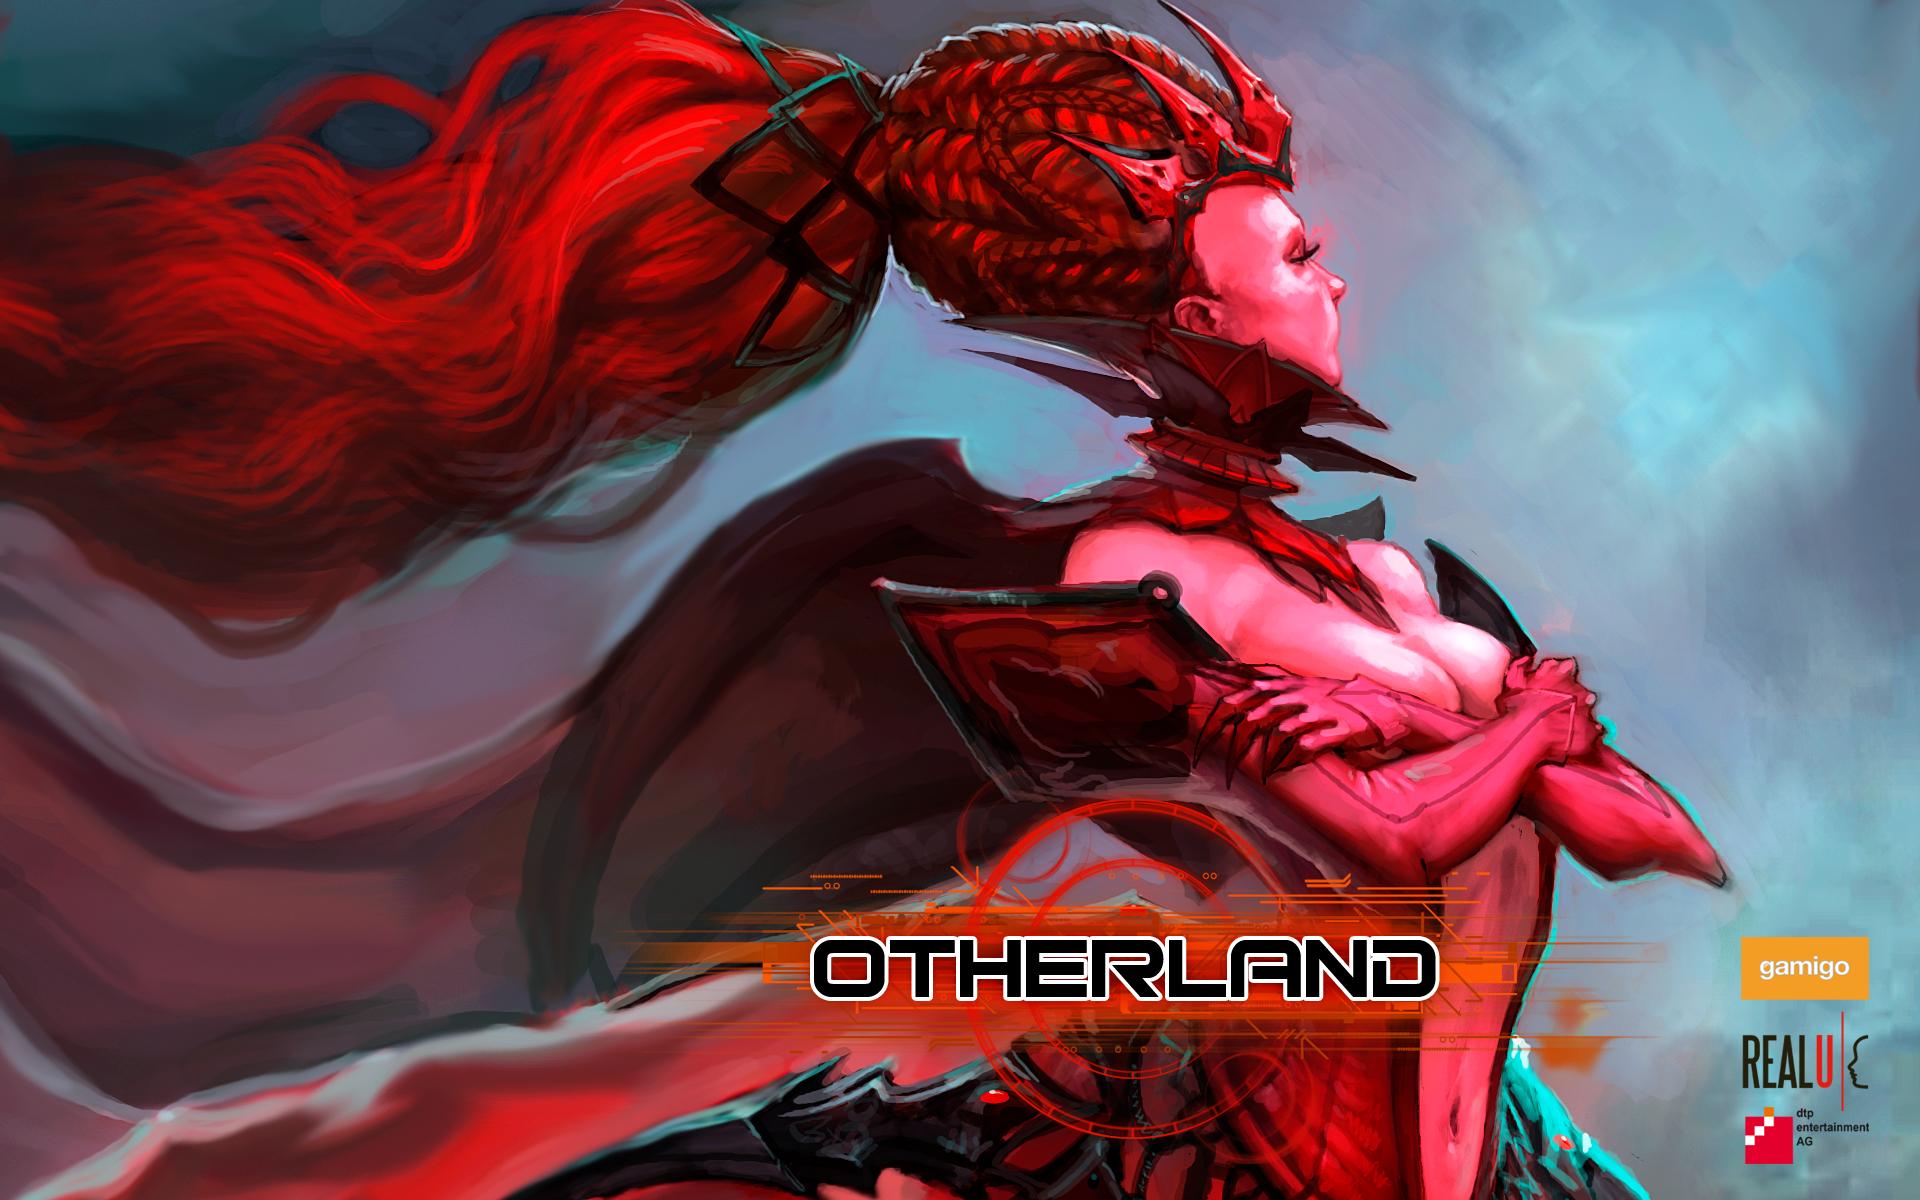 Otherland wallpaper 2